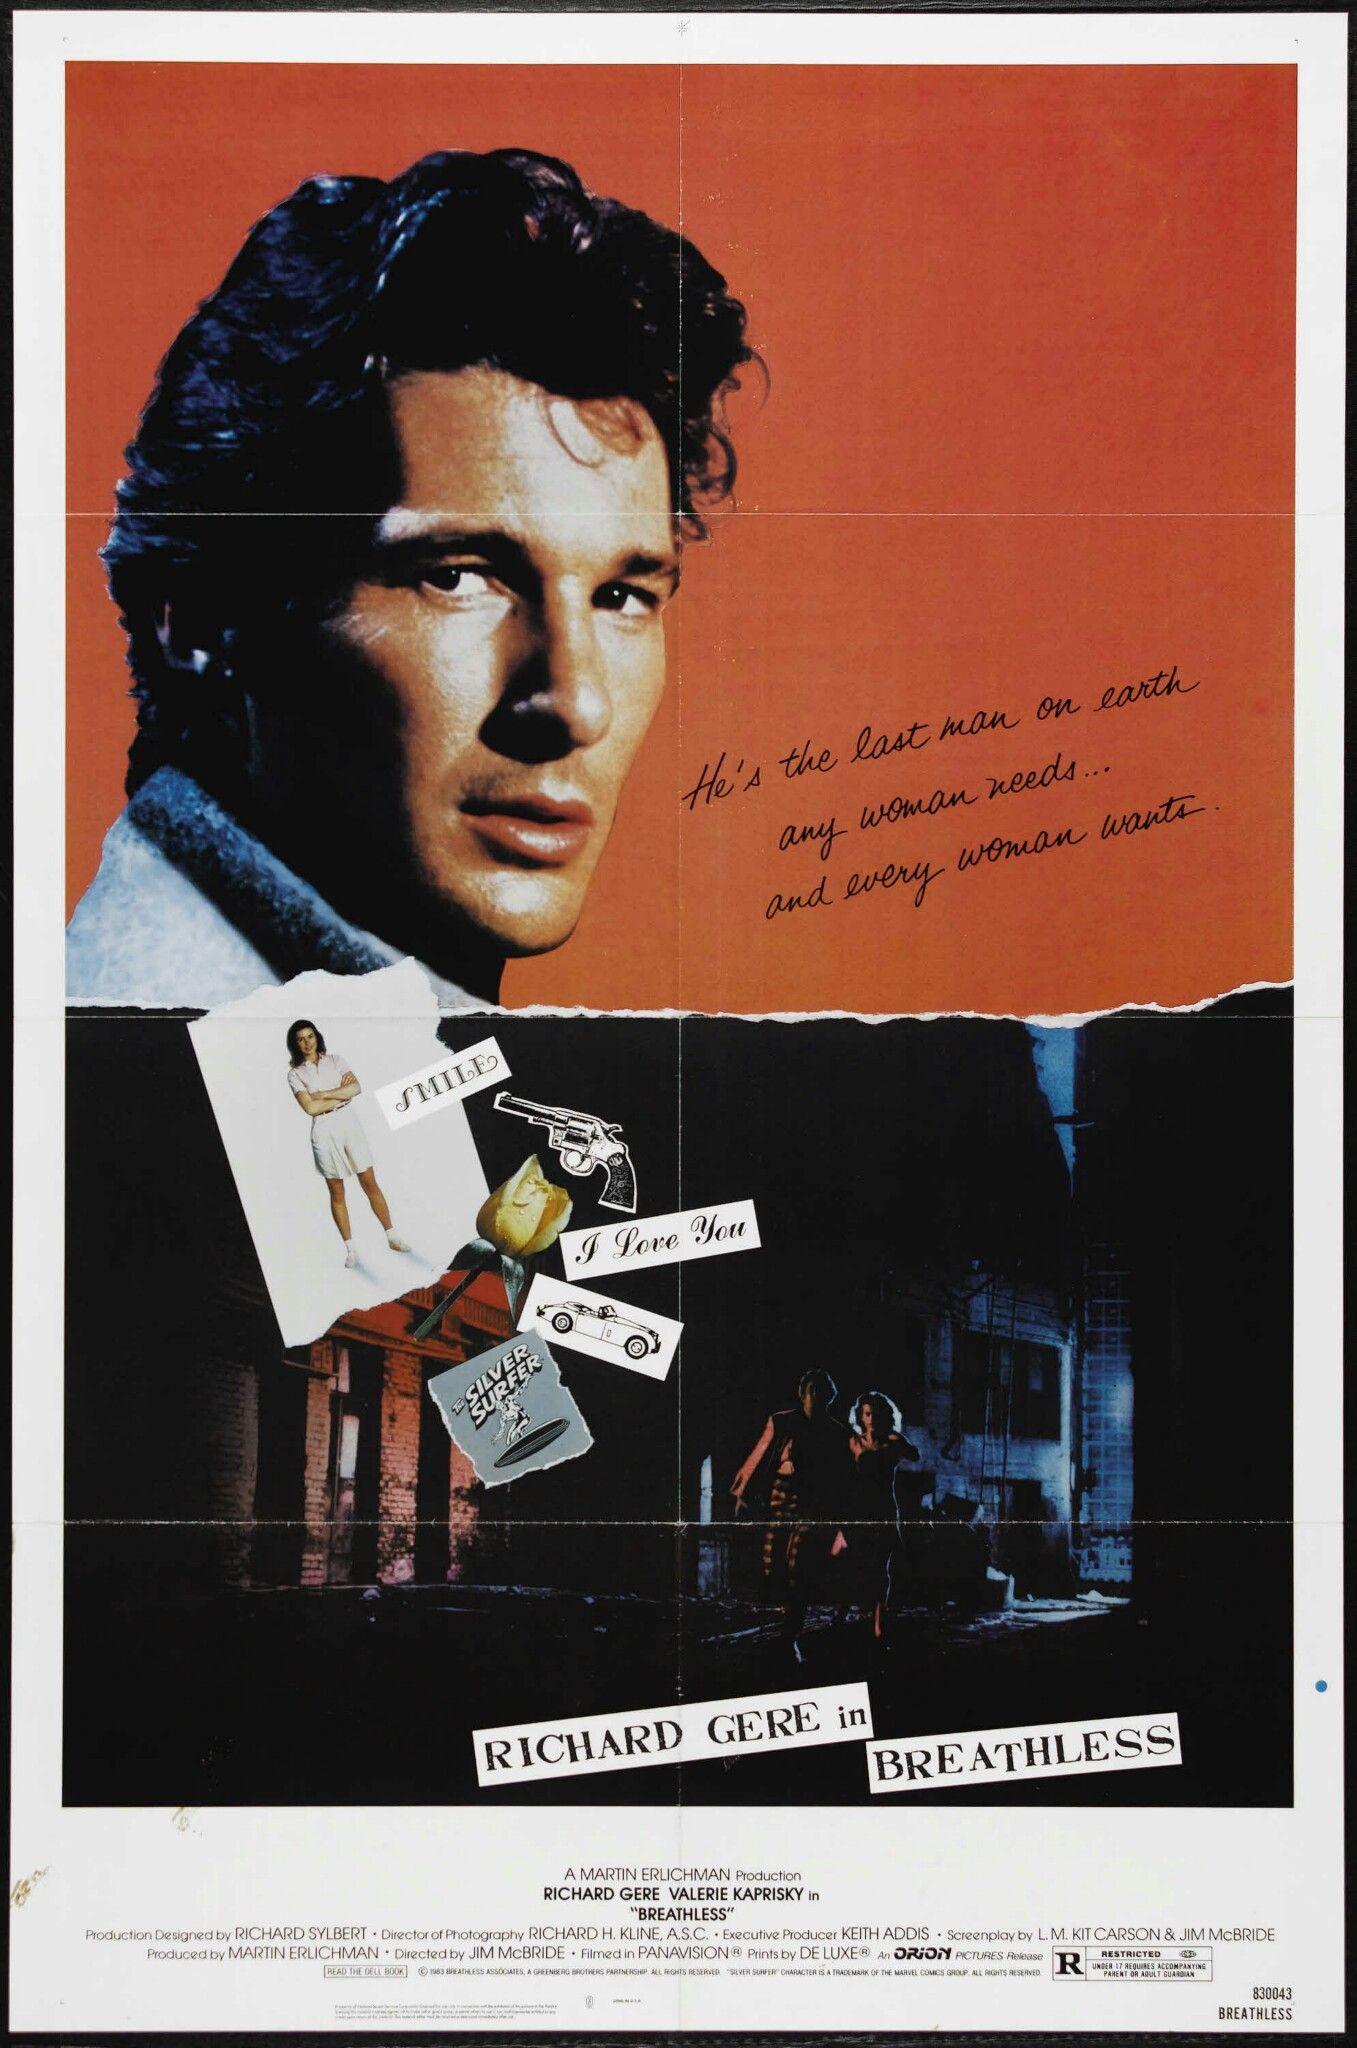 Breathless 1983 richard gere movie posters full